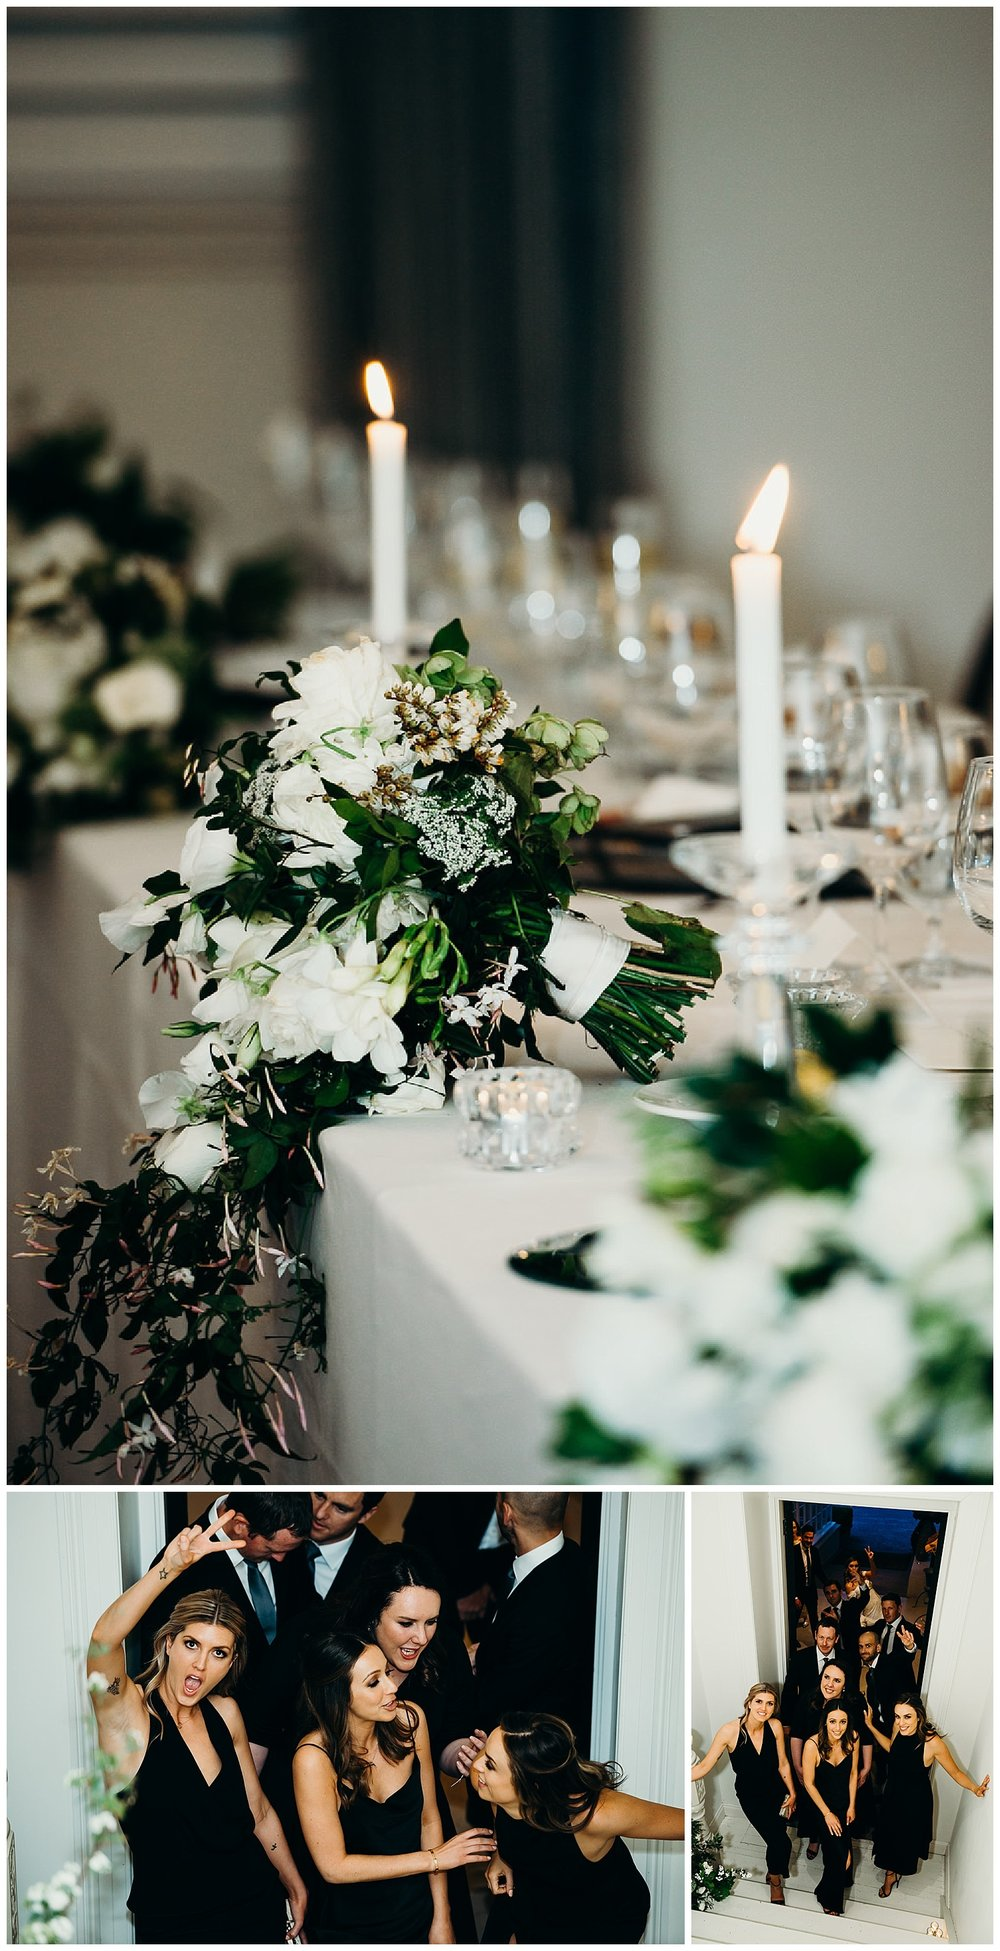 Zoe McMahon Photographer - Hopewood House - Wedding Day Photography - Georgie and David - Collage40.jpg